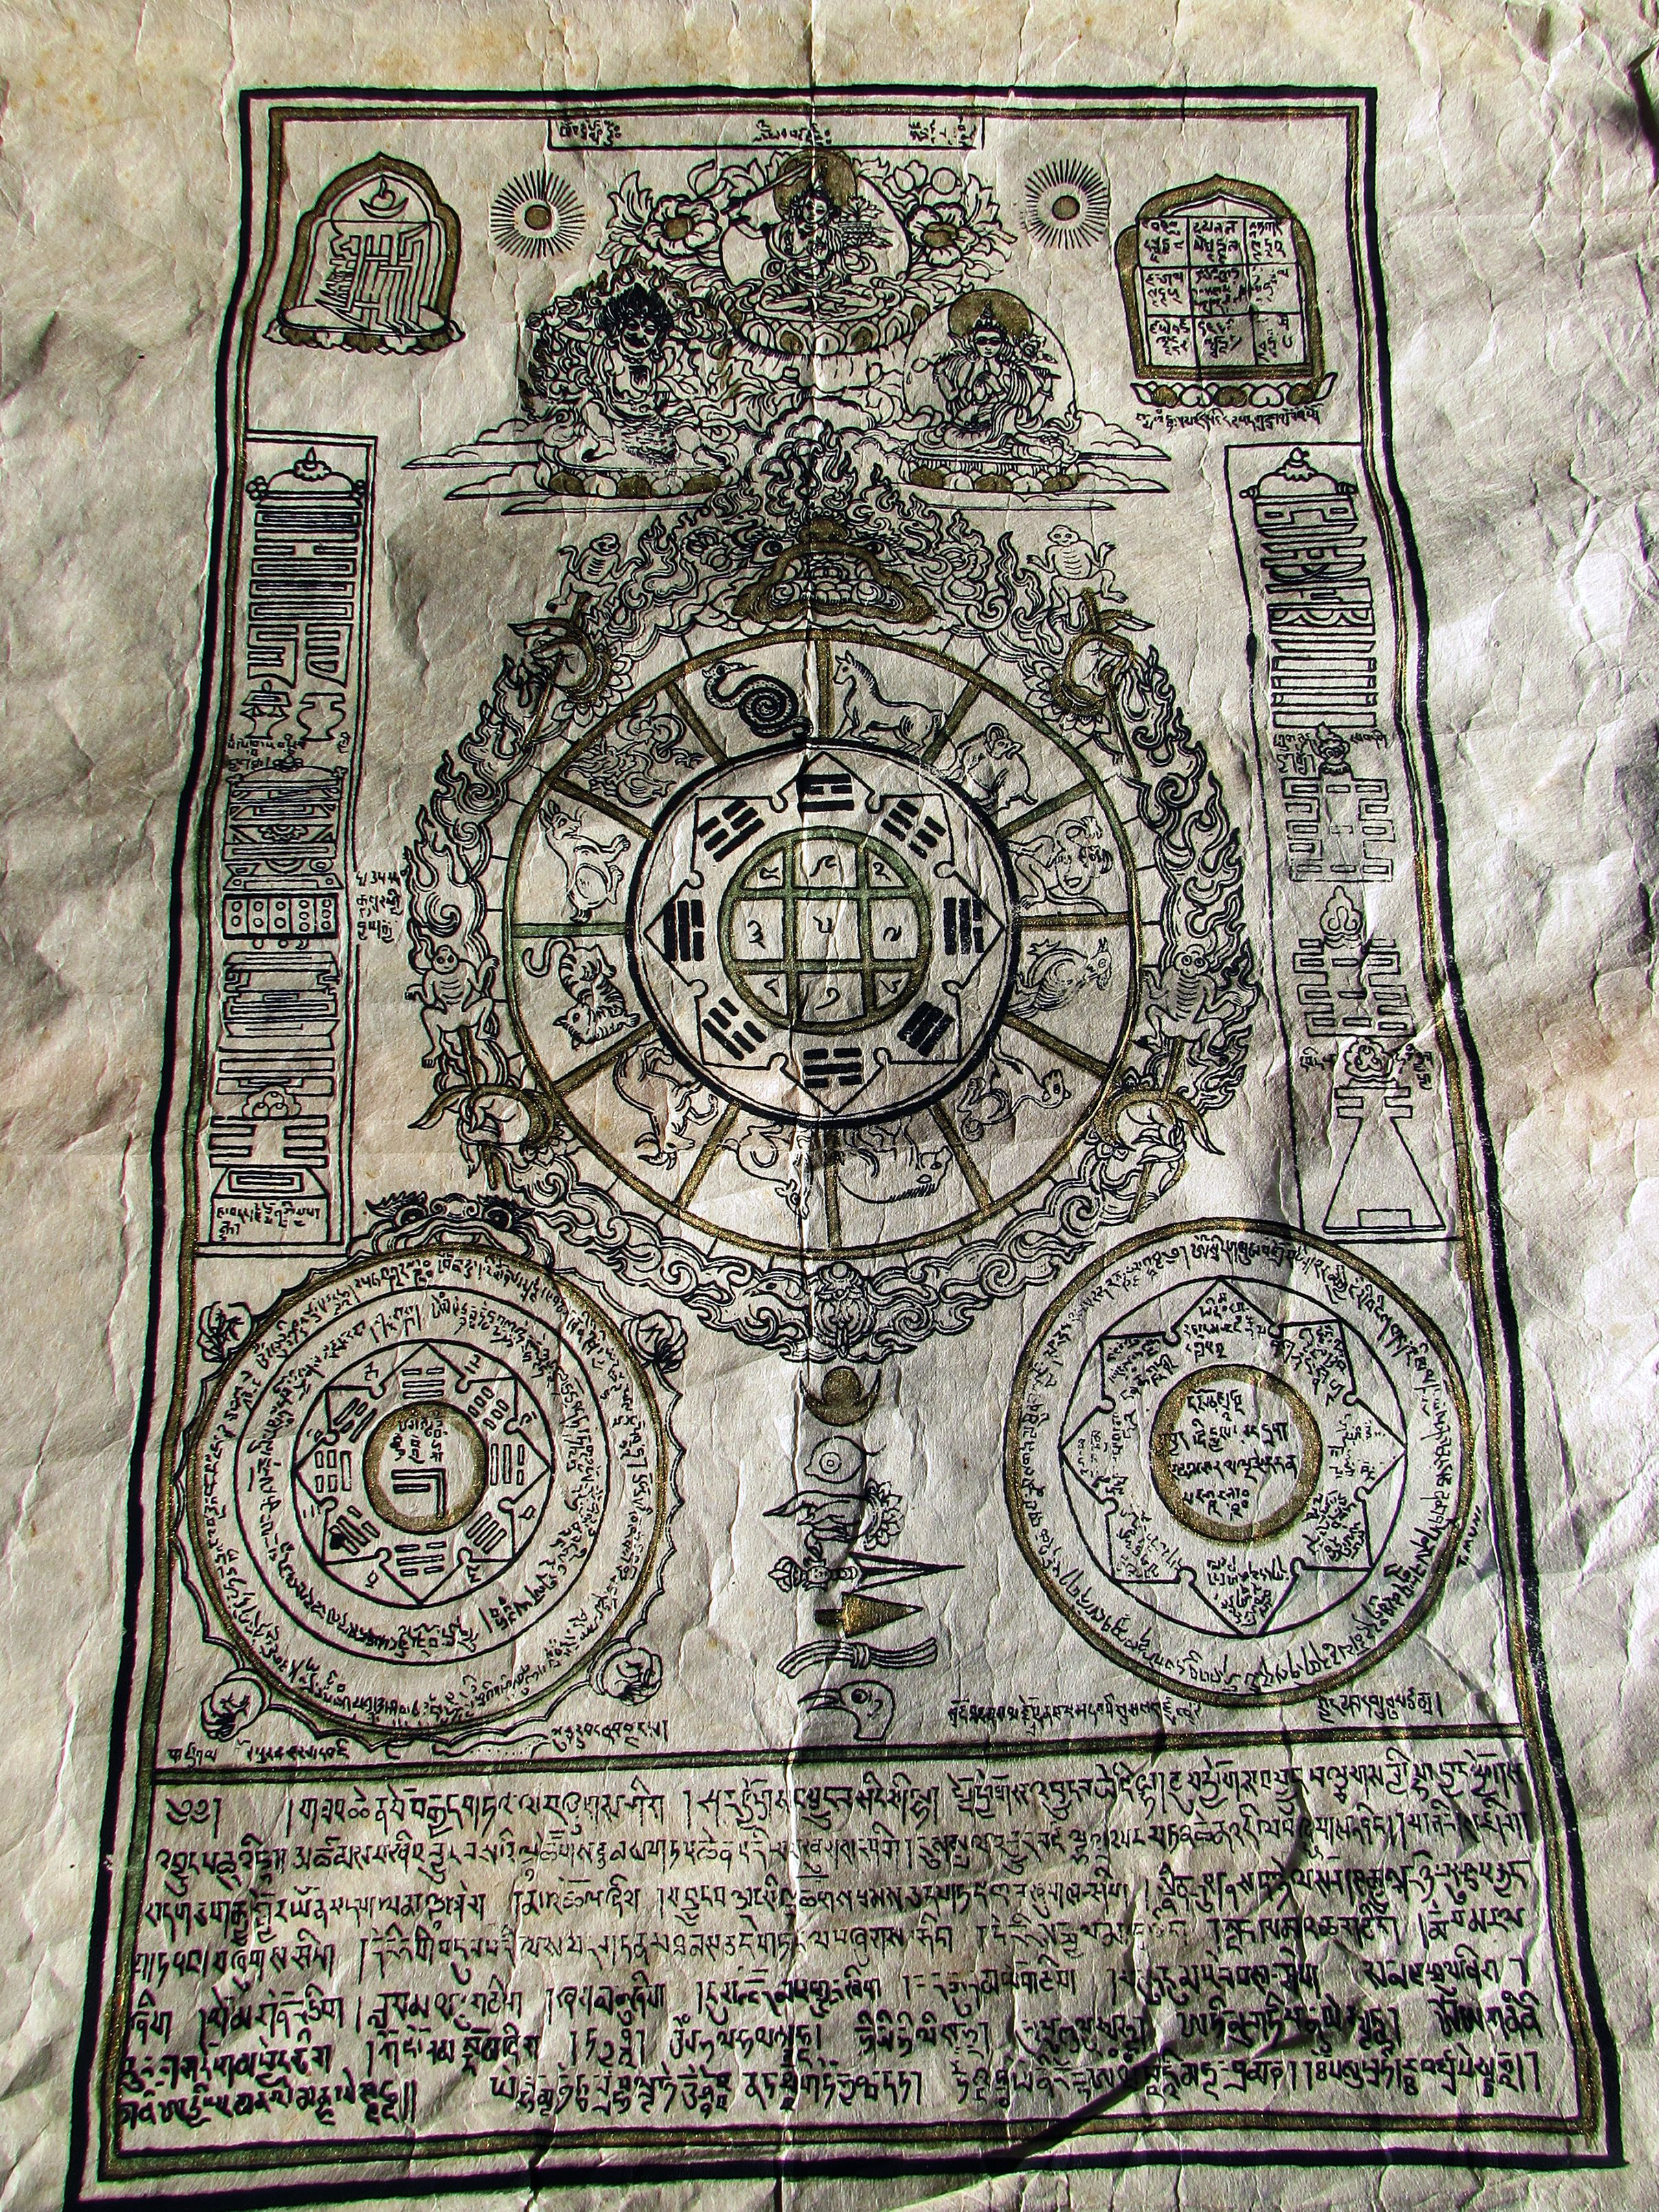 Calendario Tibetano.Calendario Tibetano Nepalese Da Kathmandu Nepal